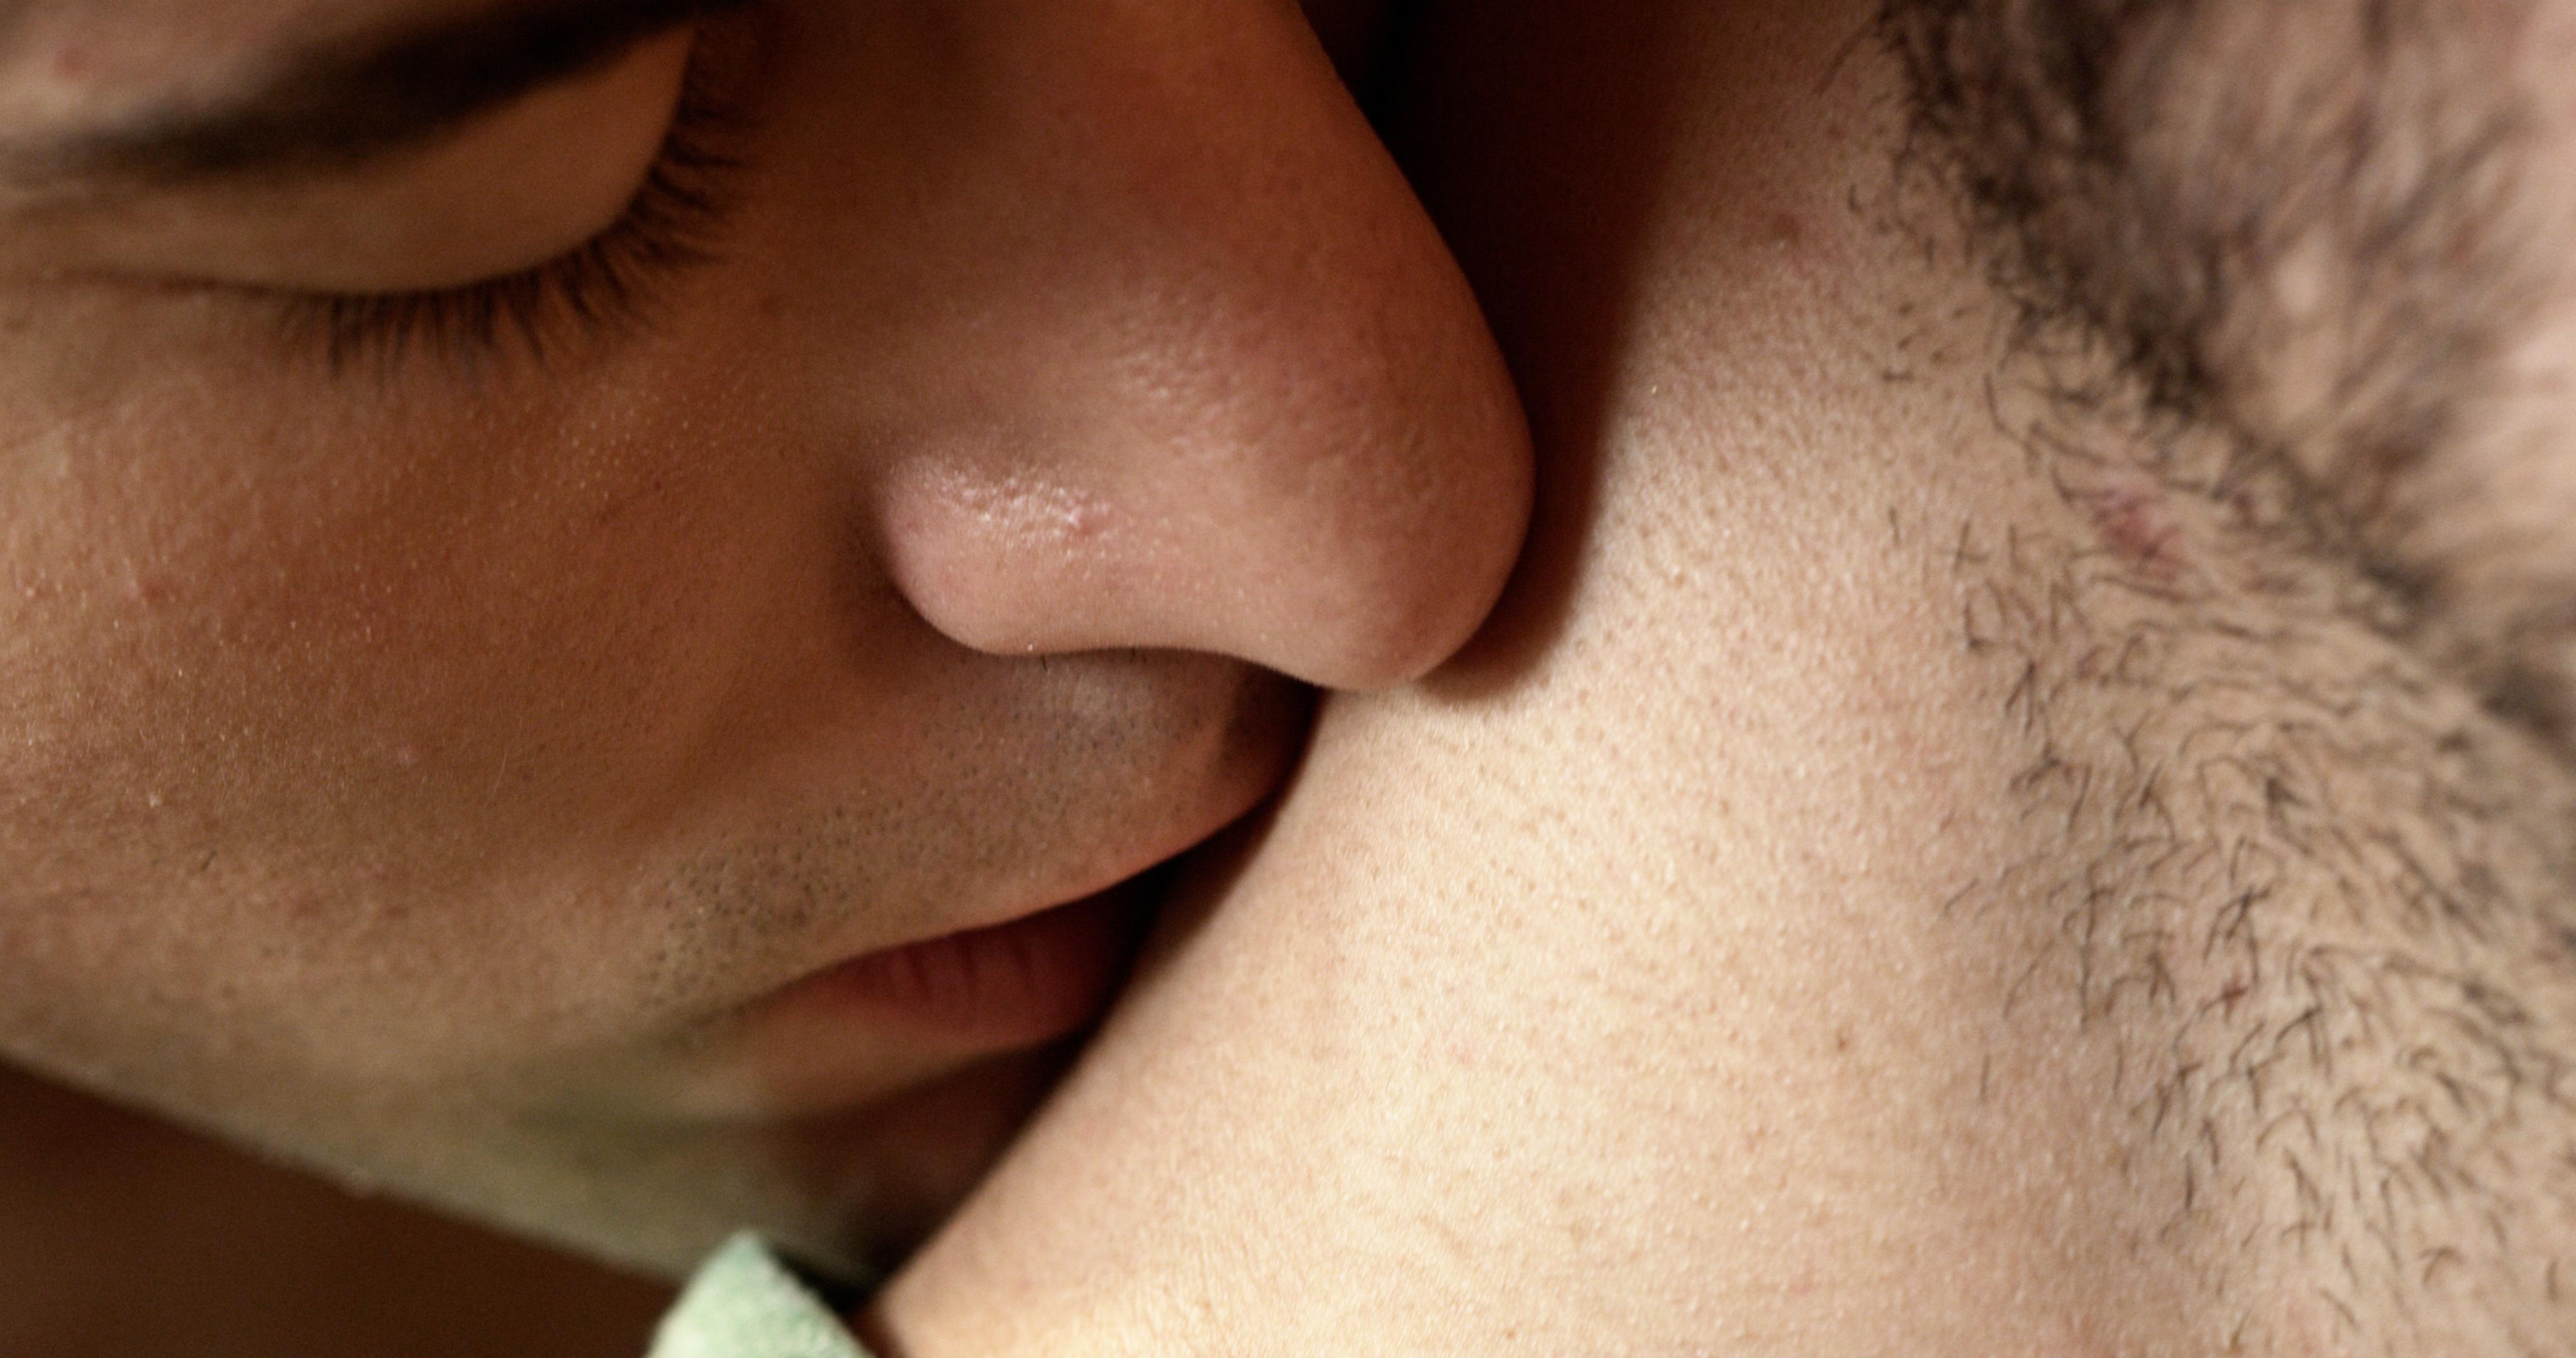 Kruiswoordraadsel dating term meestal afgekort